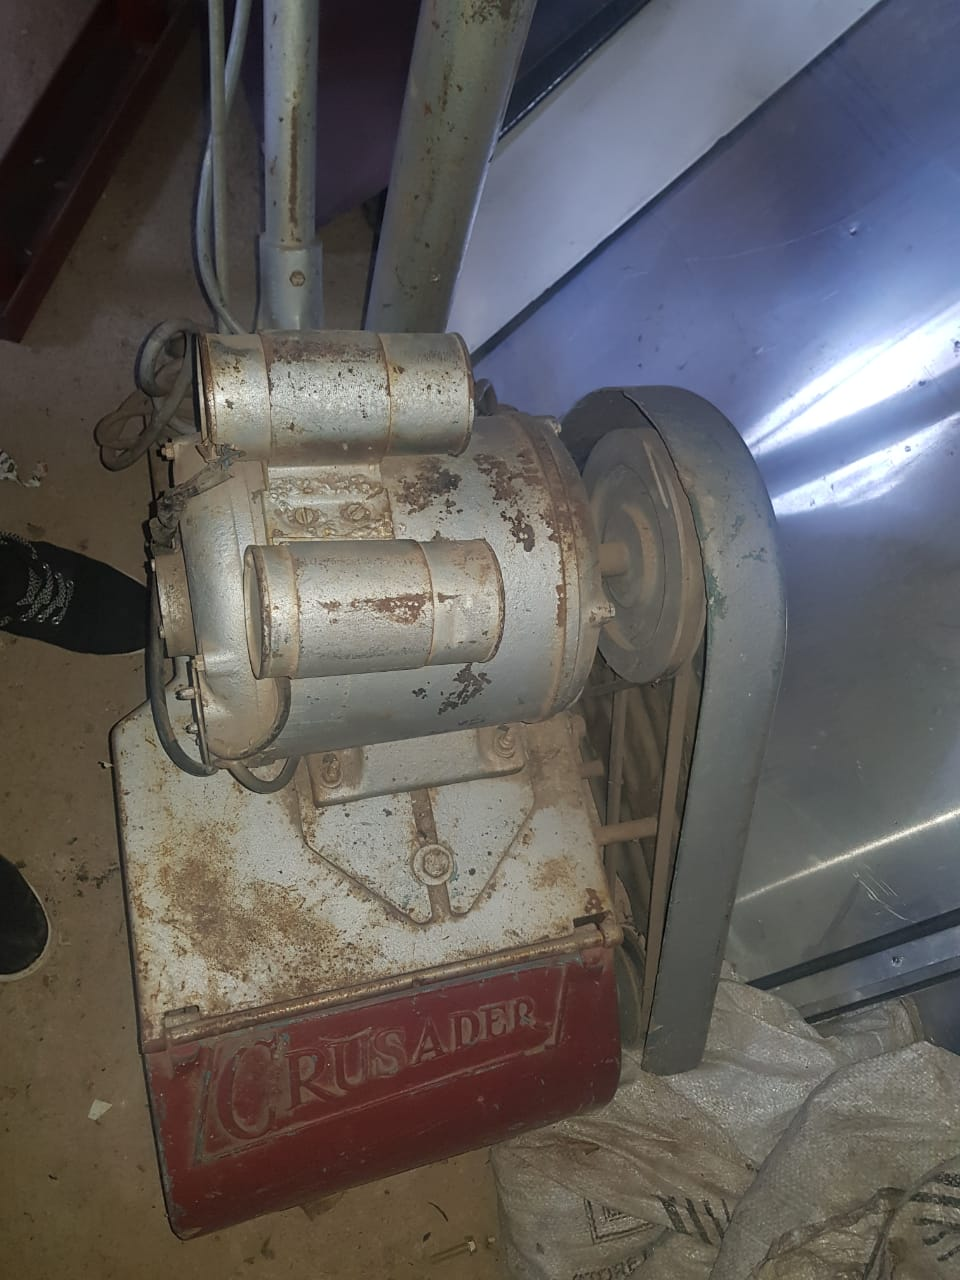 Crusader Wood sanding machine